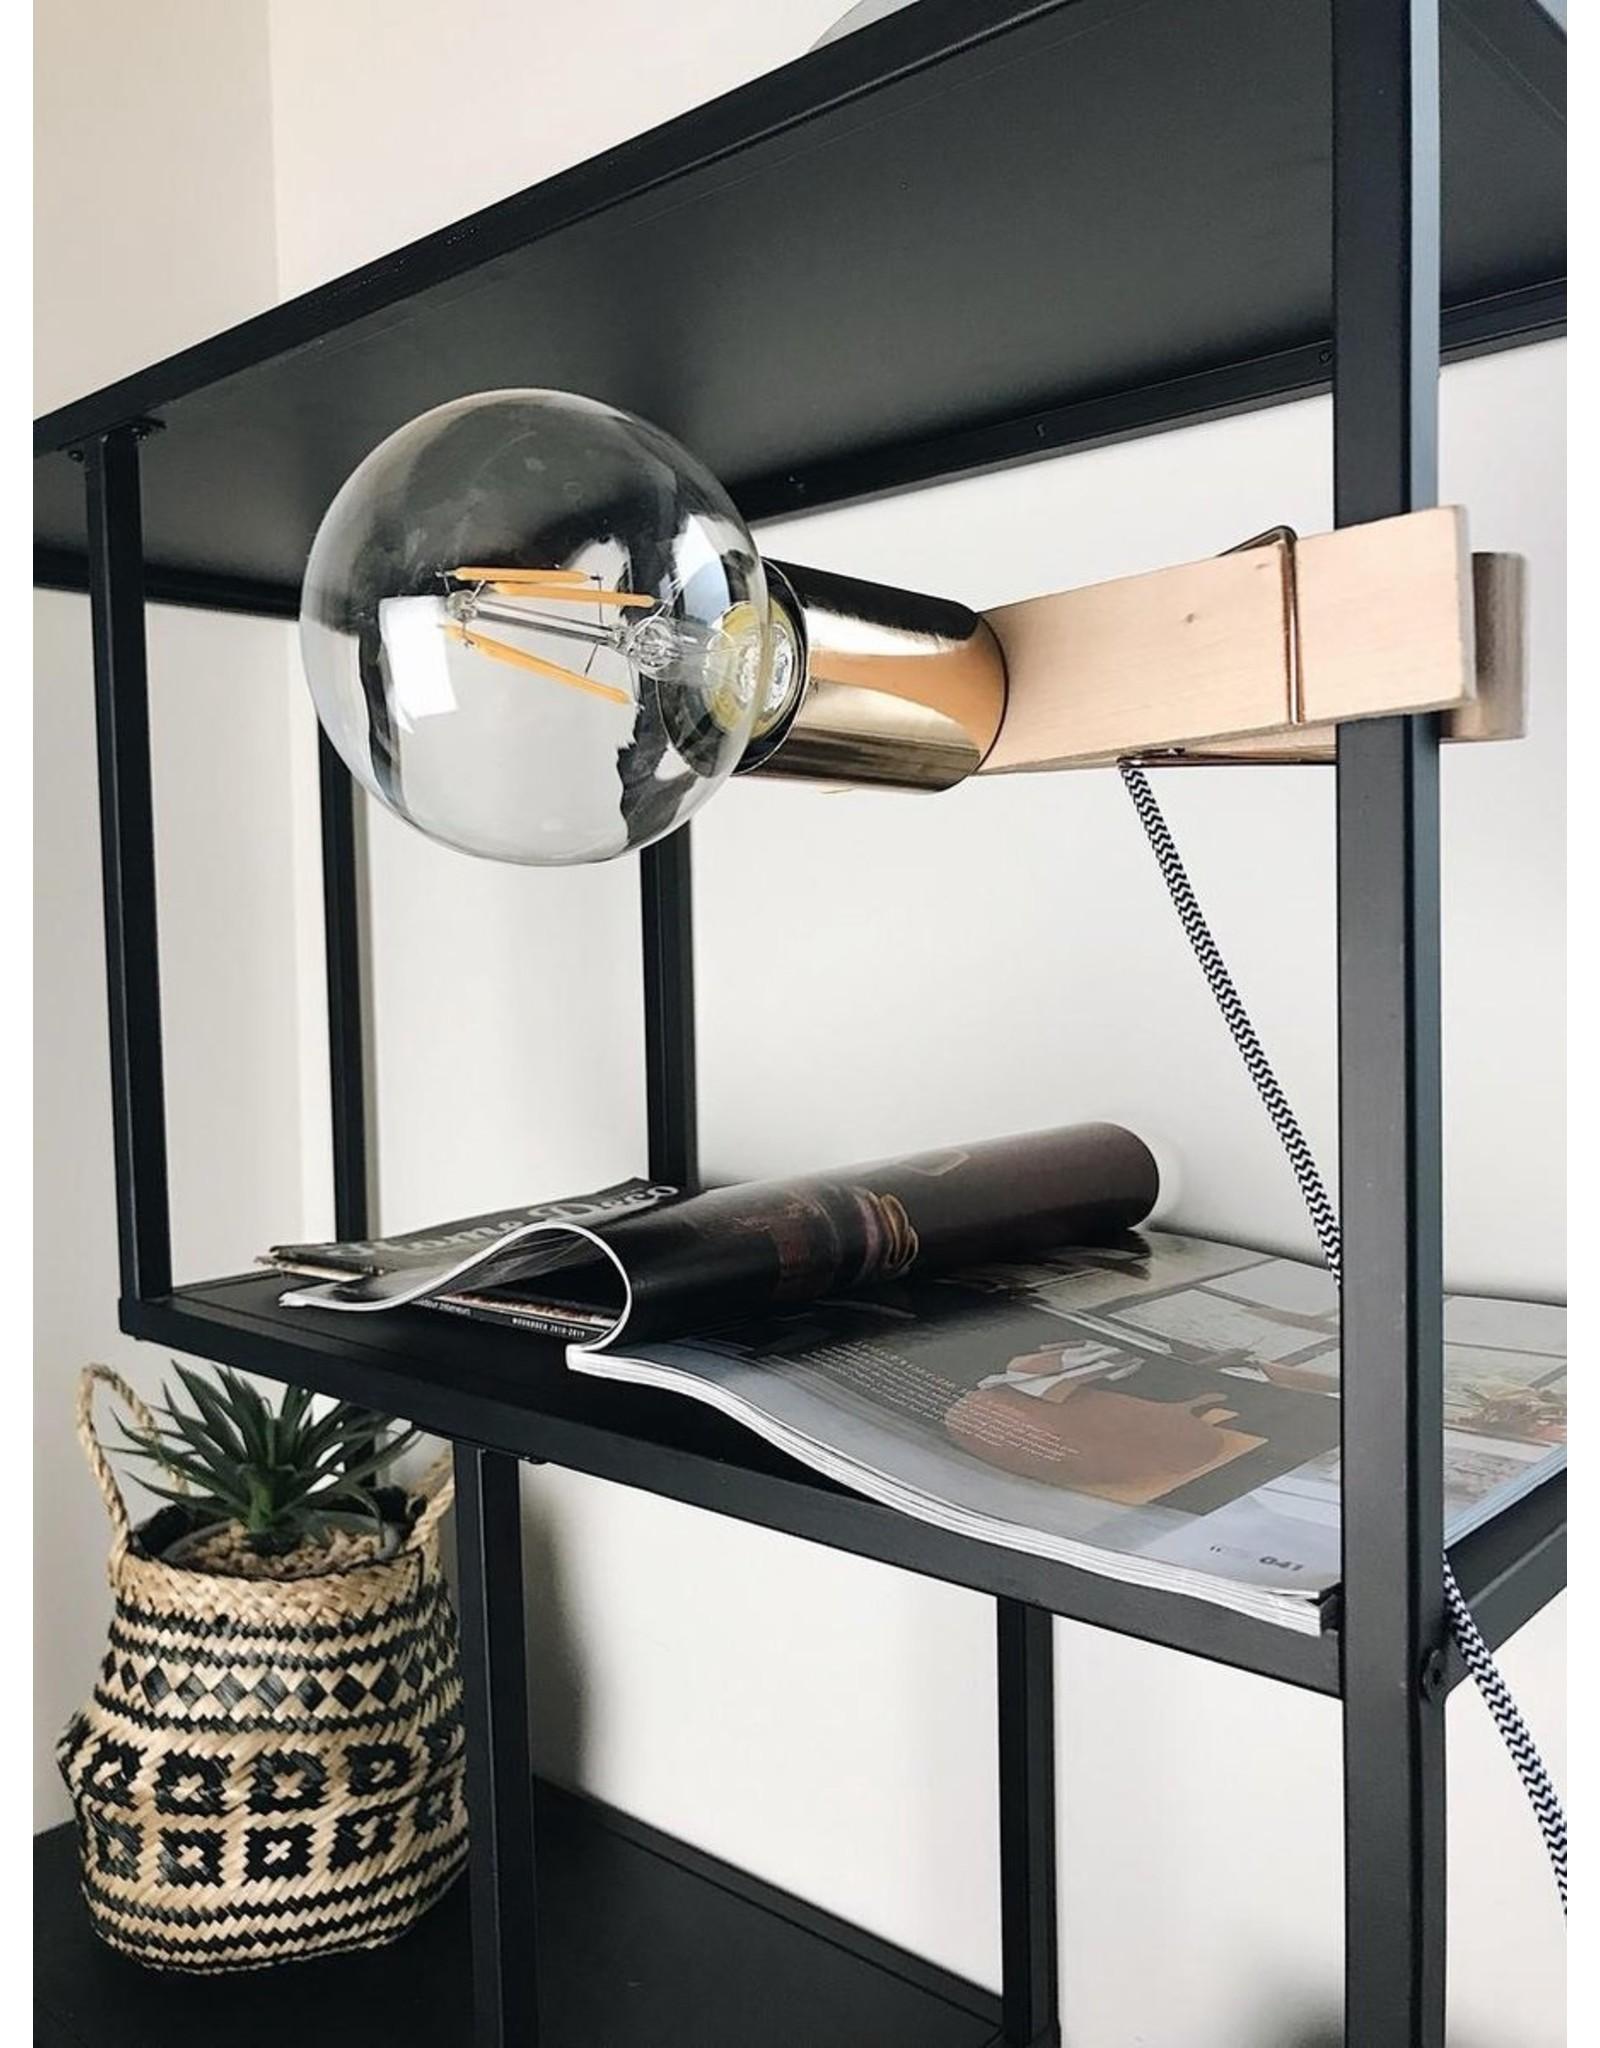 Parya Home Parya Home - Houten Knijper Lamp - Gouden Fitting